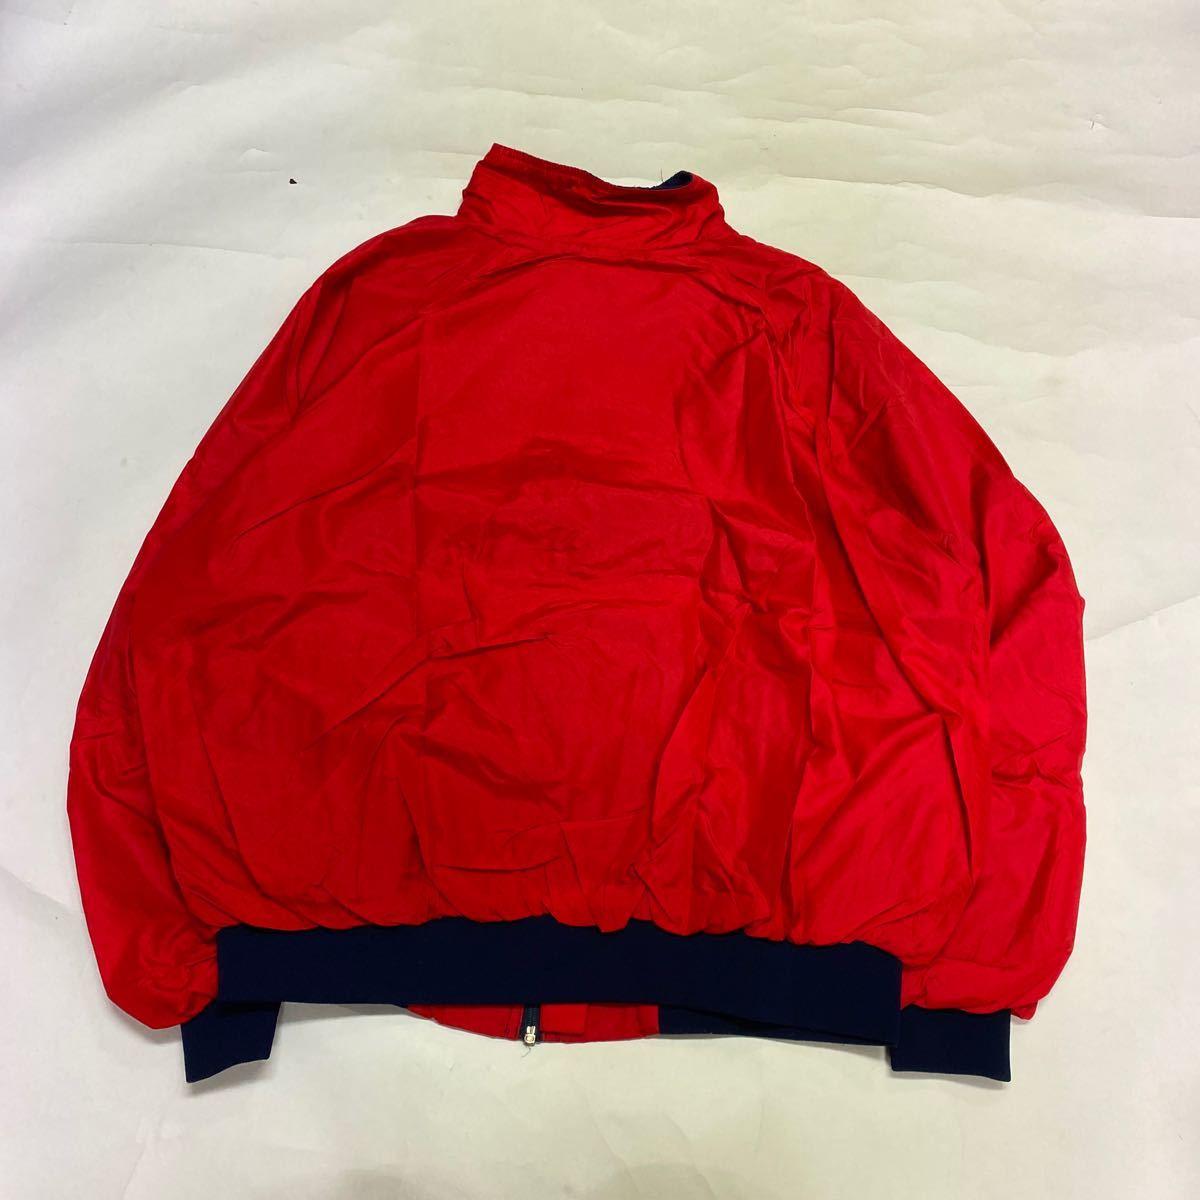 80s patagonia パタゴニア シェルチンジャケット 赤 ネイビー ut3080_画像5